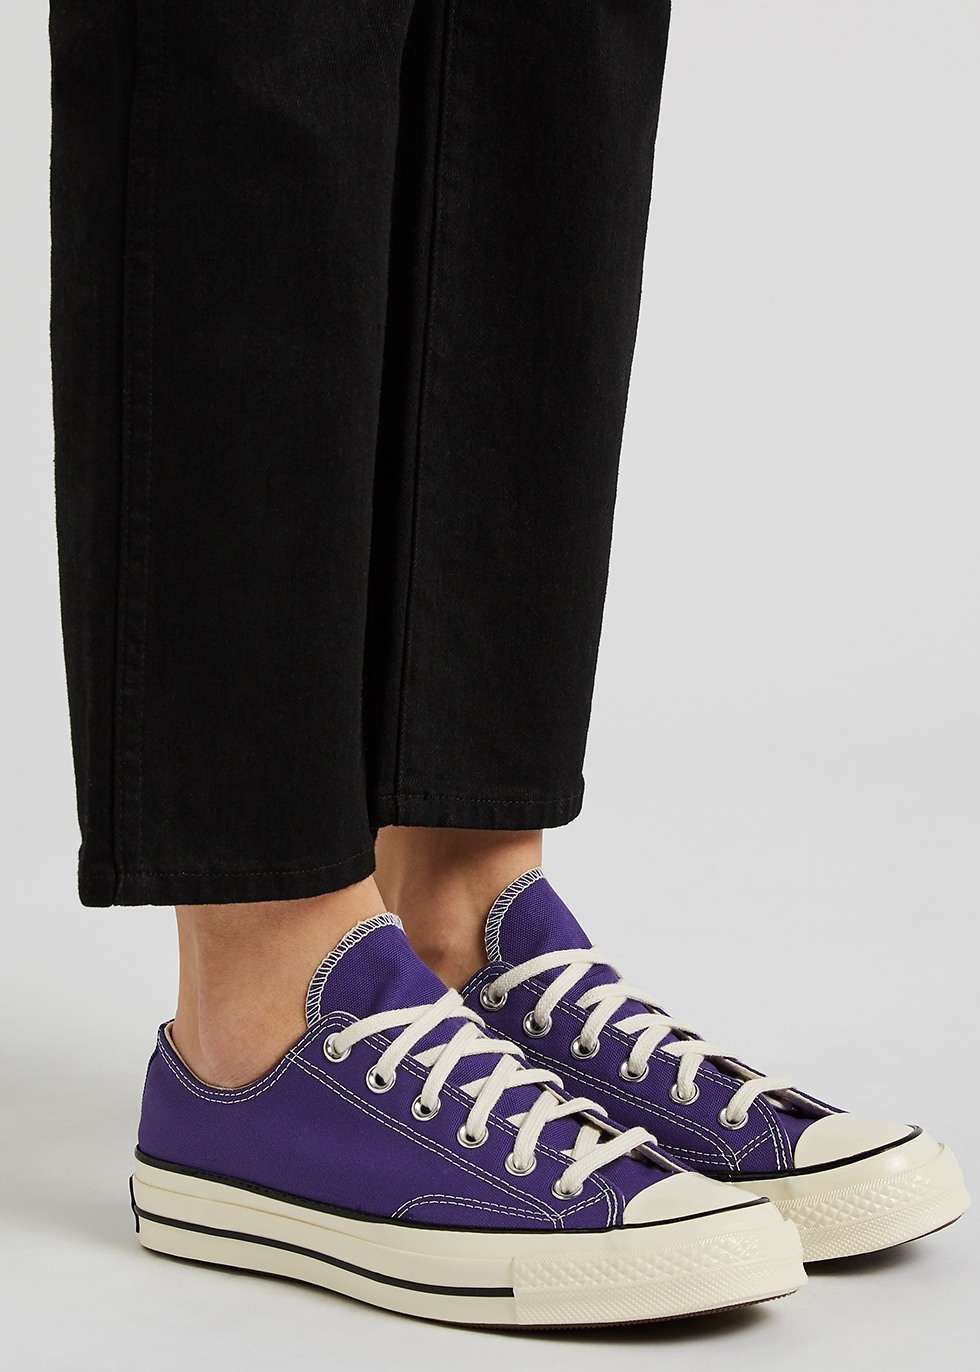 Converse Chuck 70 purple canvas sneakers - Harvey Nichols